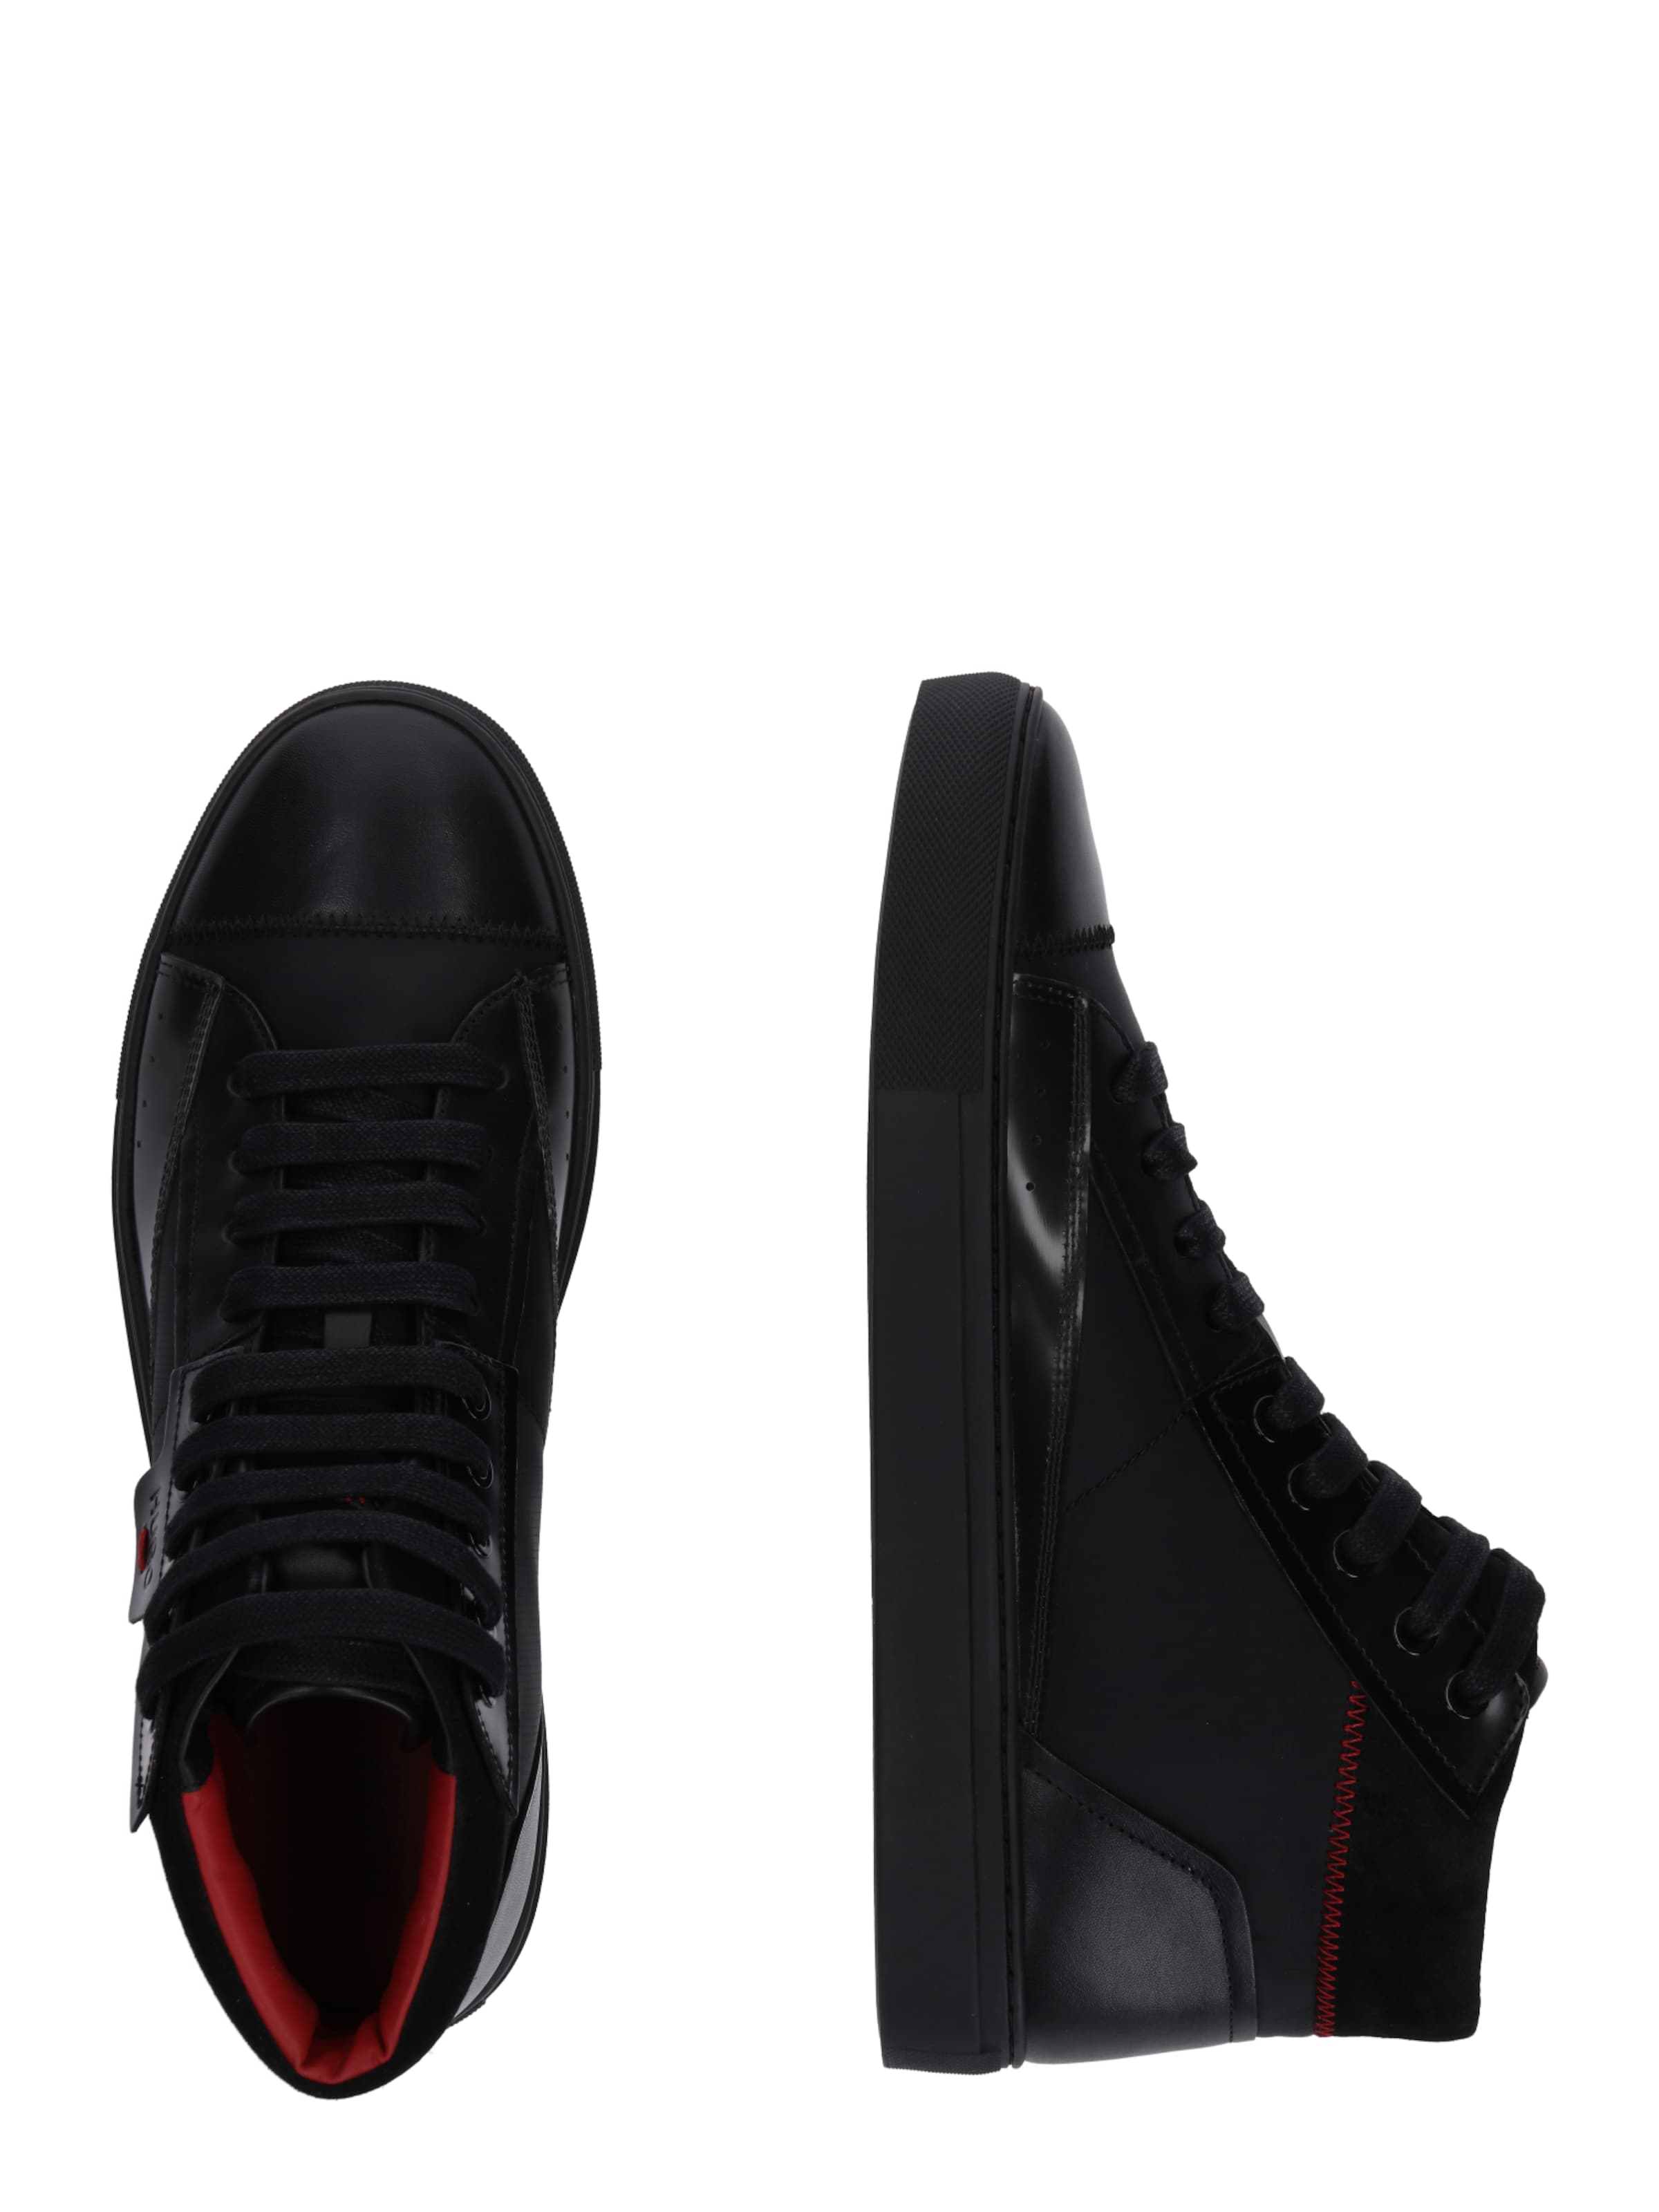 Sneaker hito Schwarz Hugo nyna' In 'futurism tsQoCrBhdx